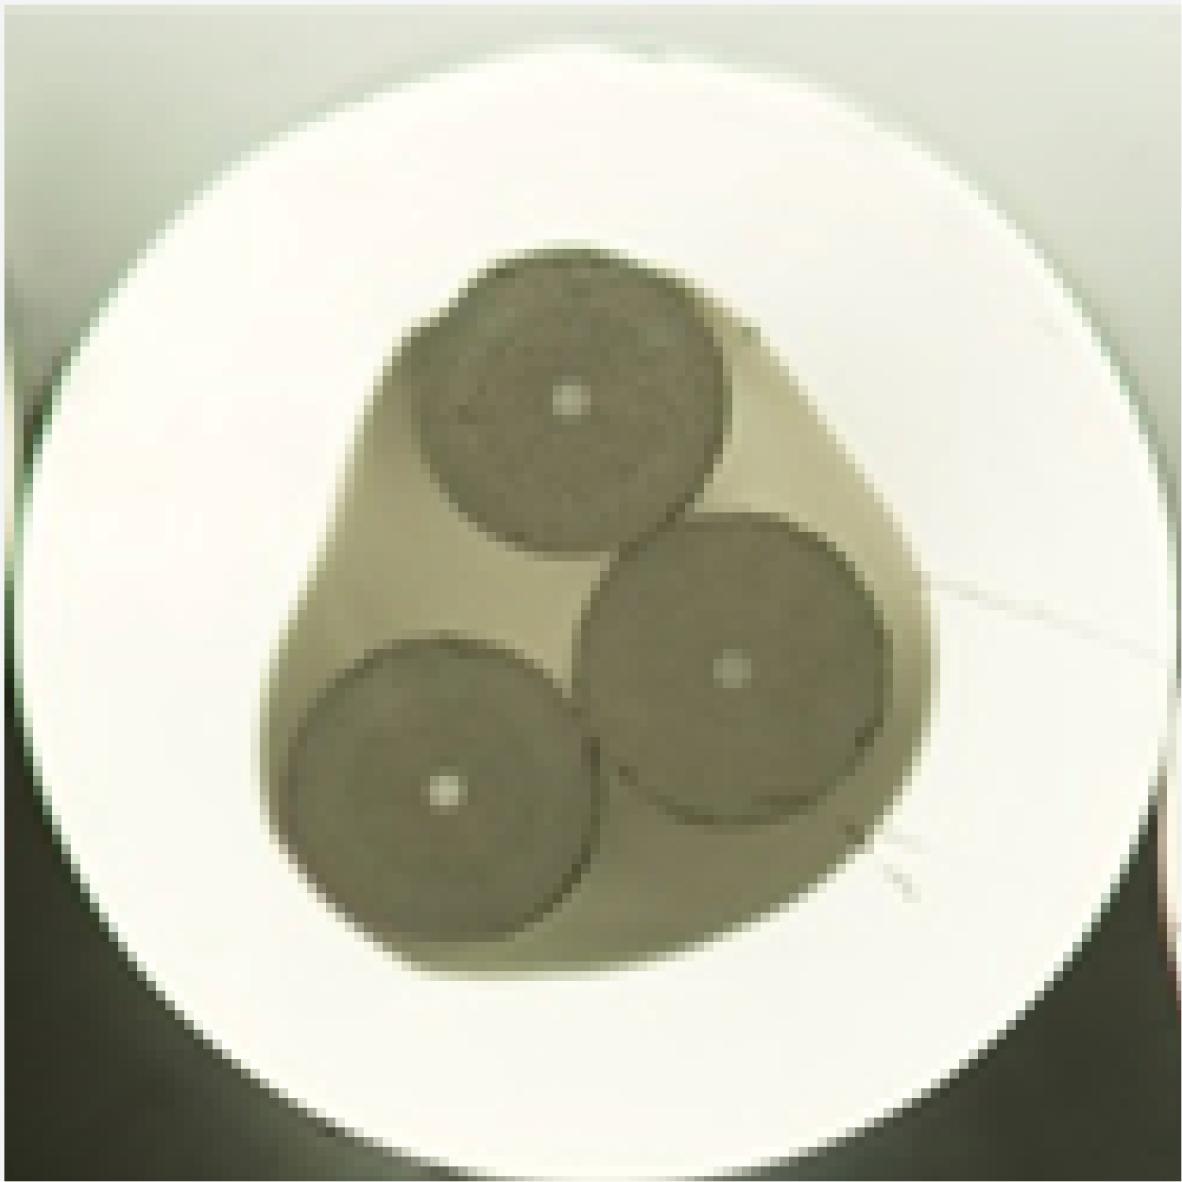 Passive 3 element optical fibre - 3 MEF compact